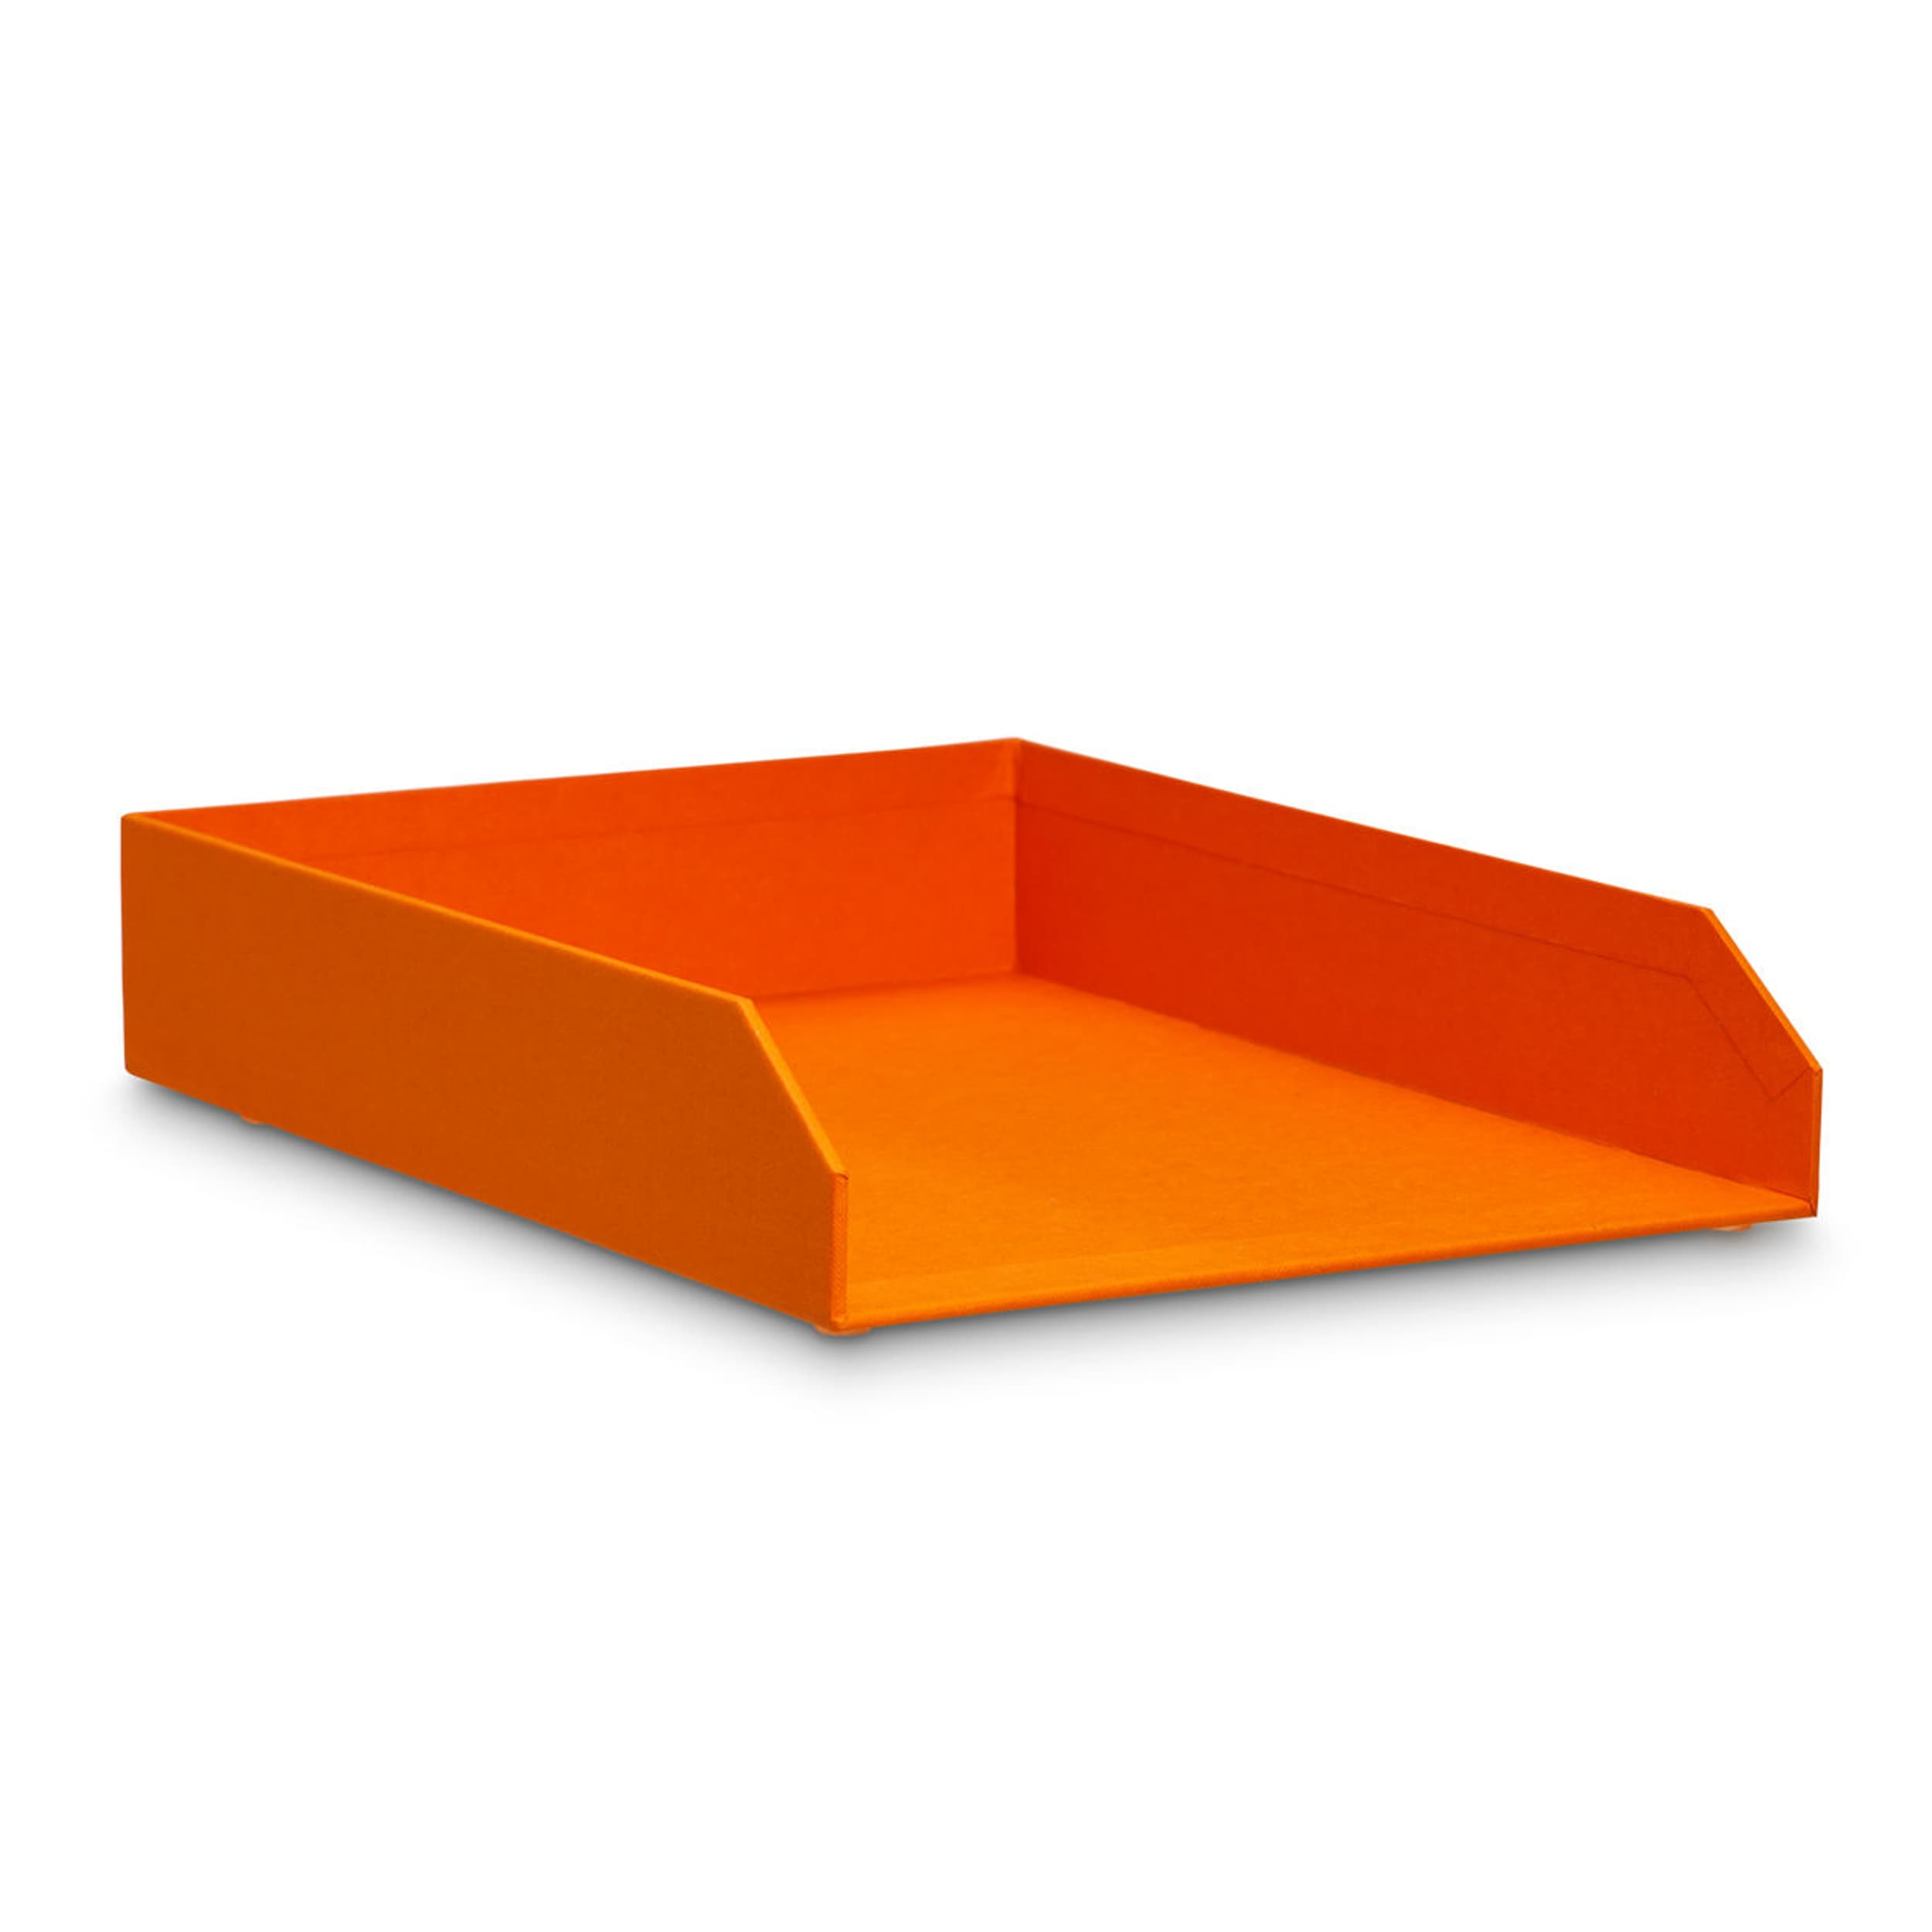 Image of Papierablage BIGSO CLASSIC